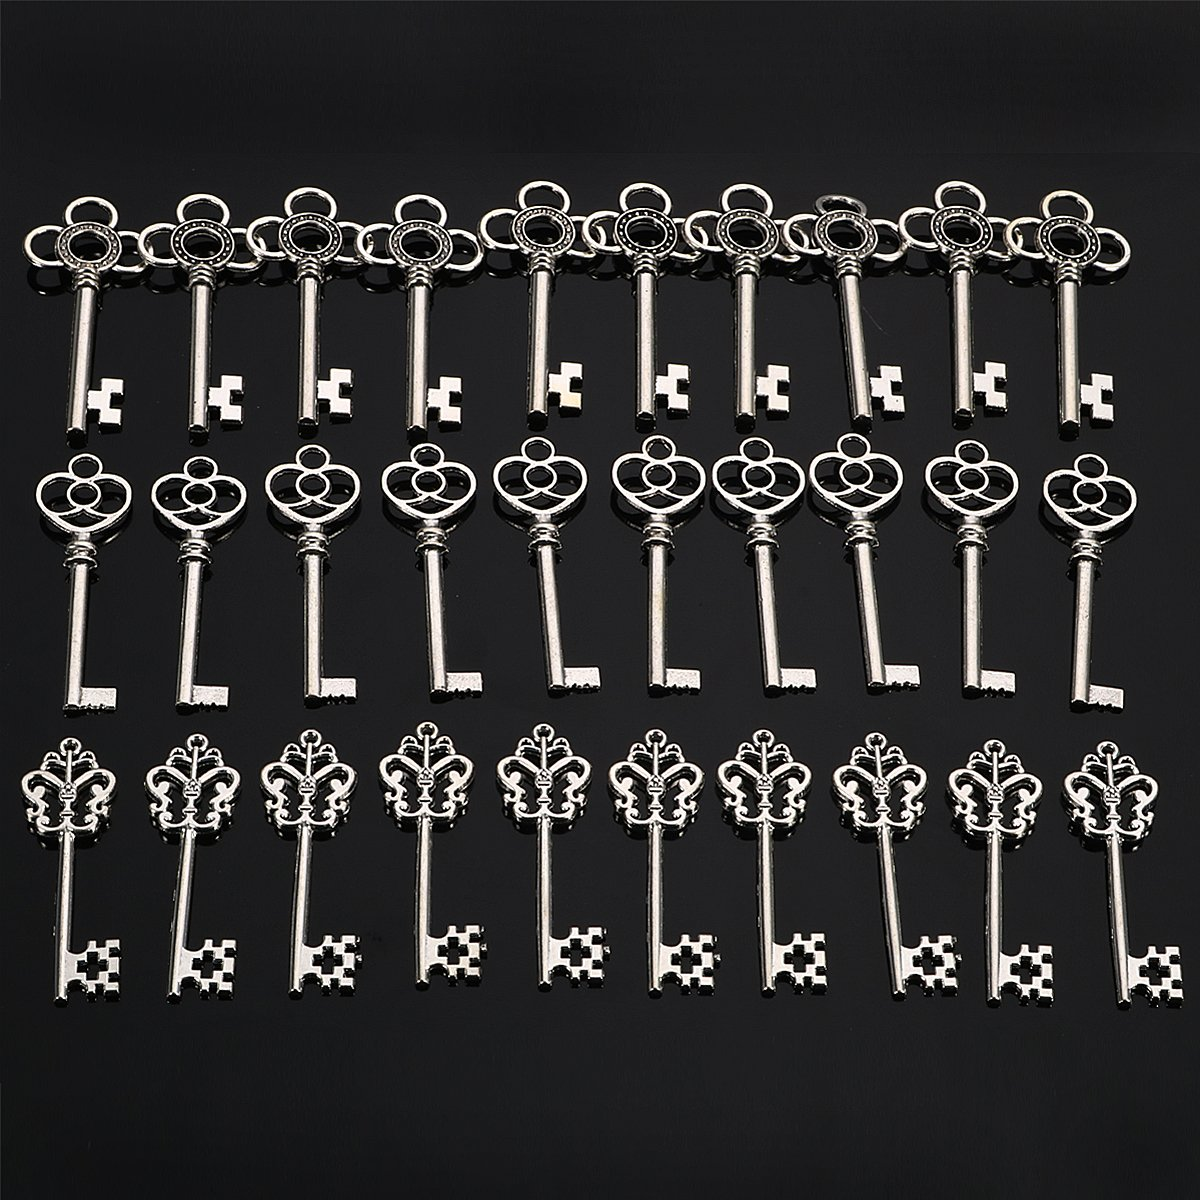 Jeteven Retro Schlüssel Anhänger Bronze Silber Vintage Schmuck Basteln Key Kette Halskette Armband antik Deko (30er)